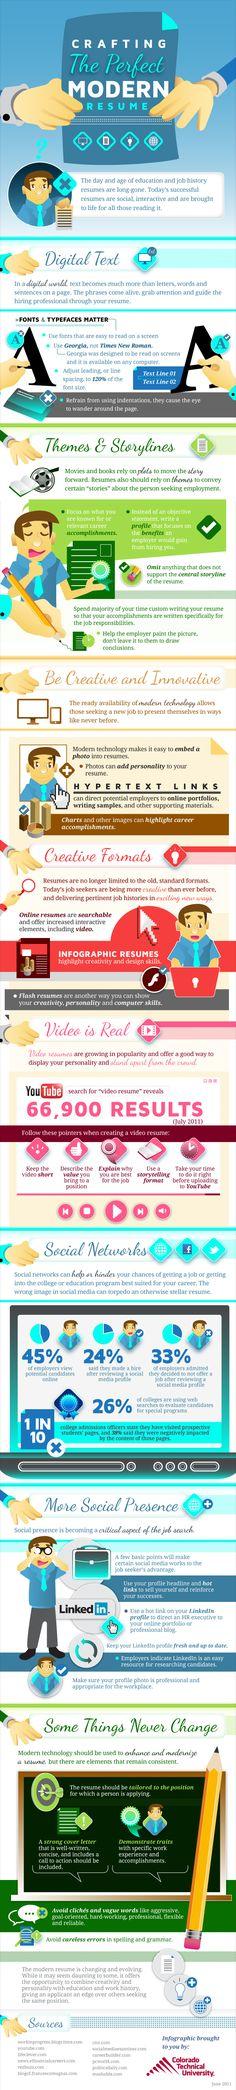 creative-cv-infographic